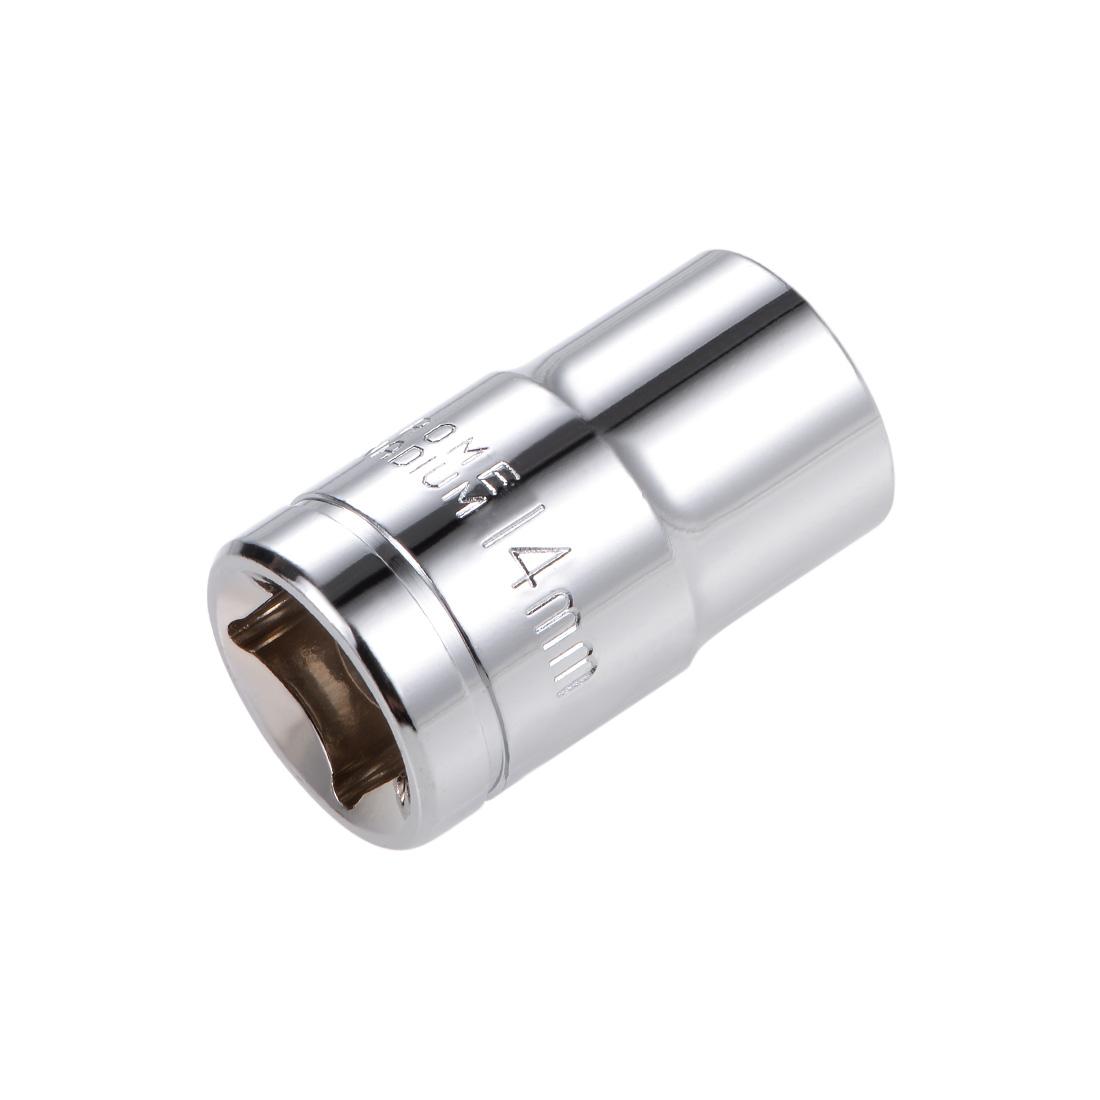 1/2-inch Drive E14 Universal Spline Socket Shallow 12 Point Cr-V Steel